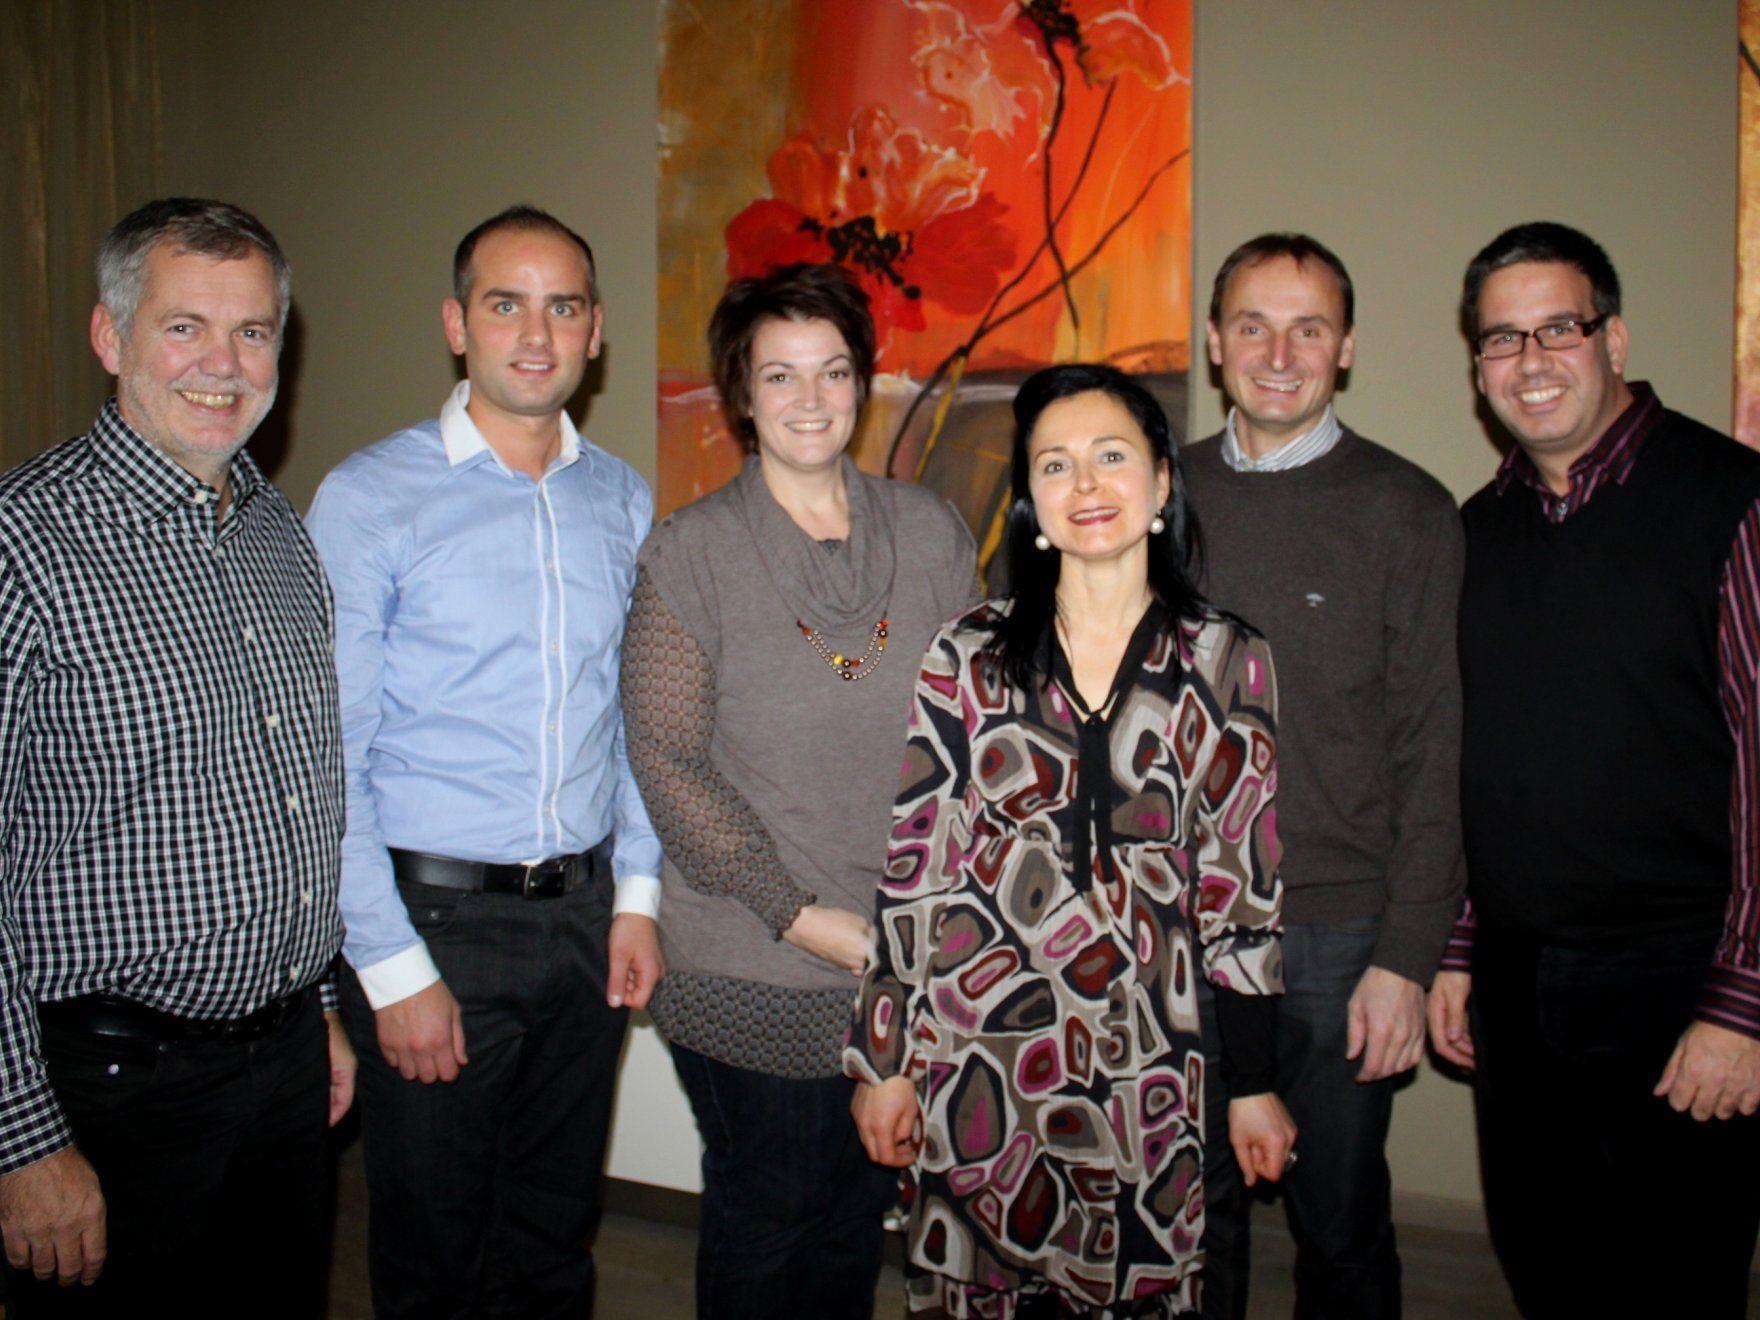 Robert Sturn, Josef Mager, Nadja Natter, Veronika Matt, Alfons Rädler, Alexander Meister, von links.